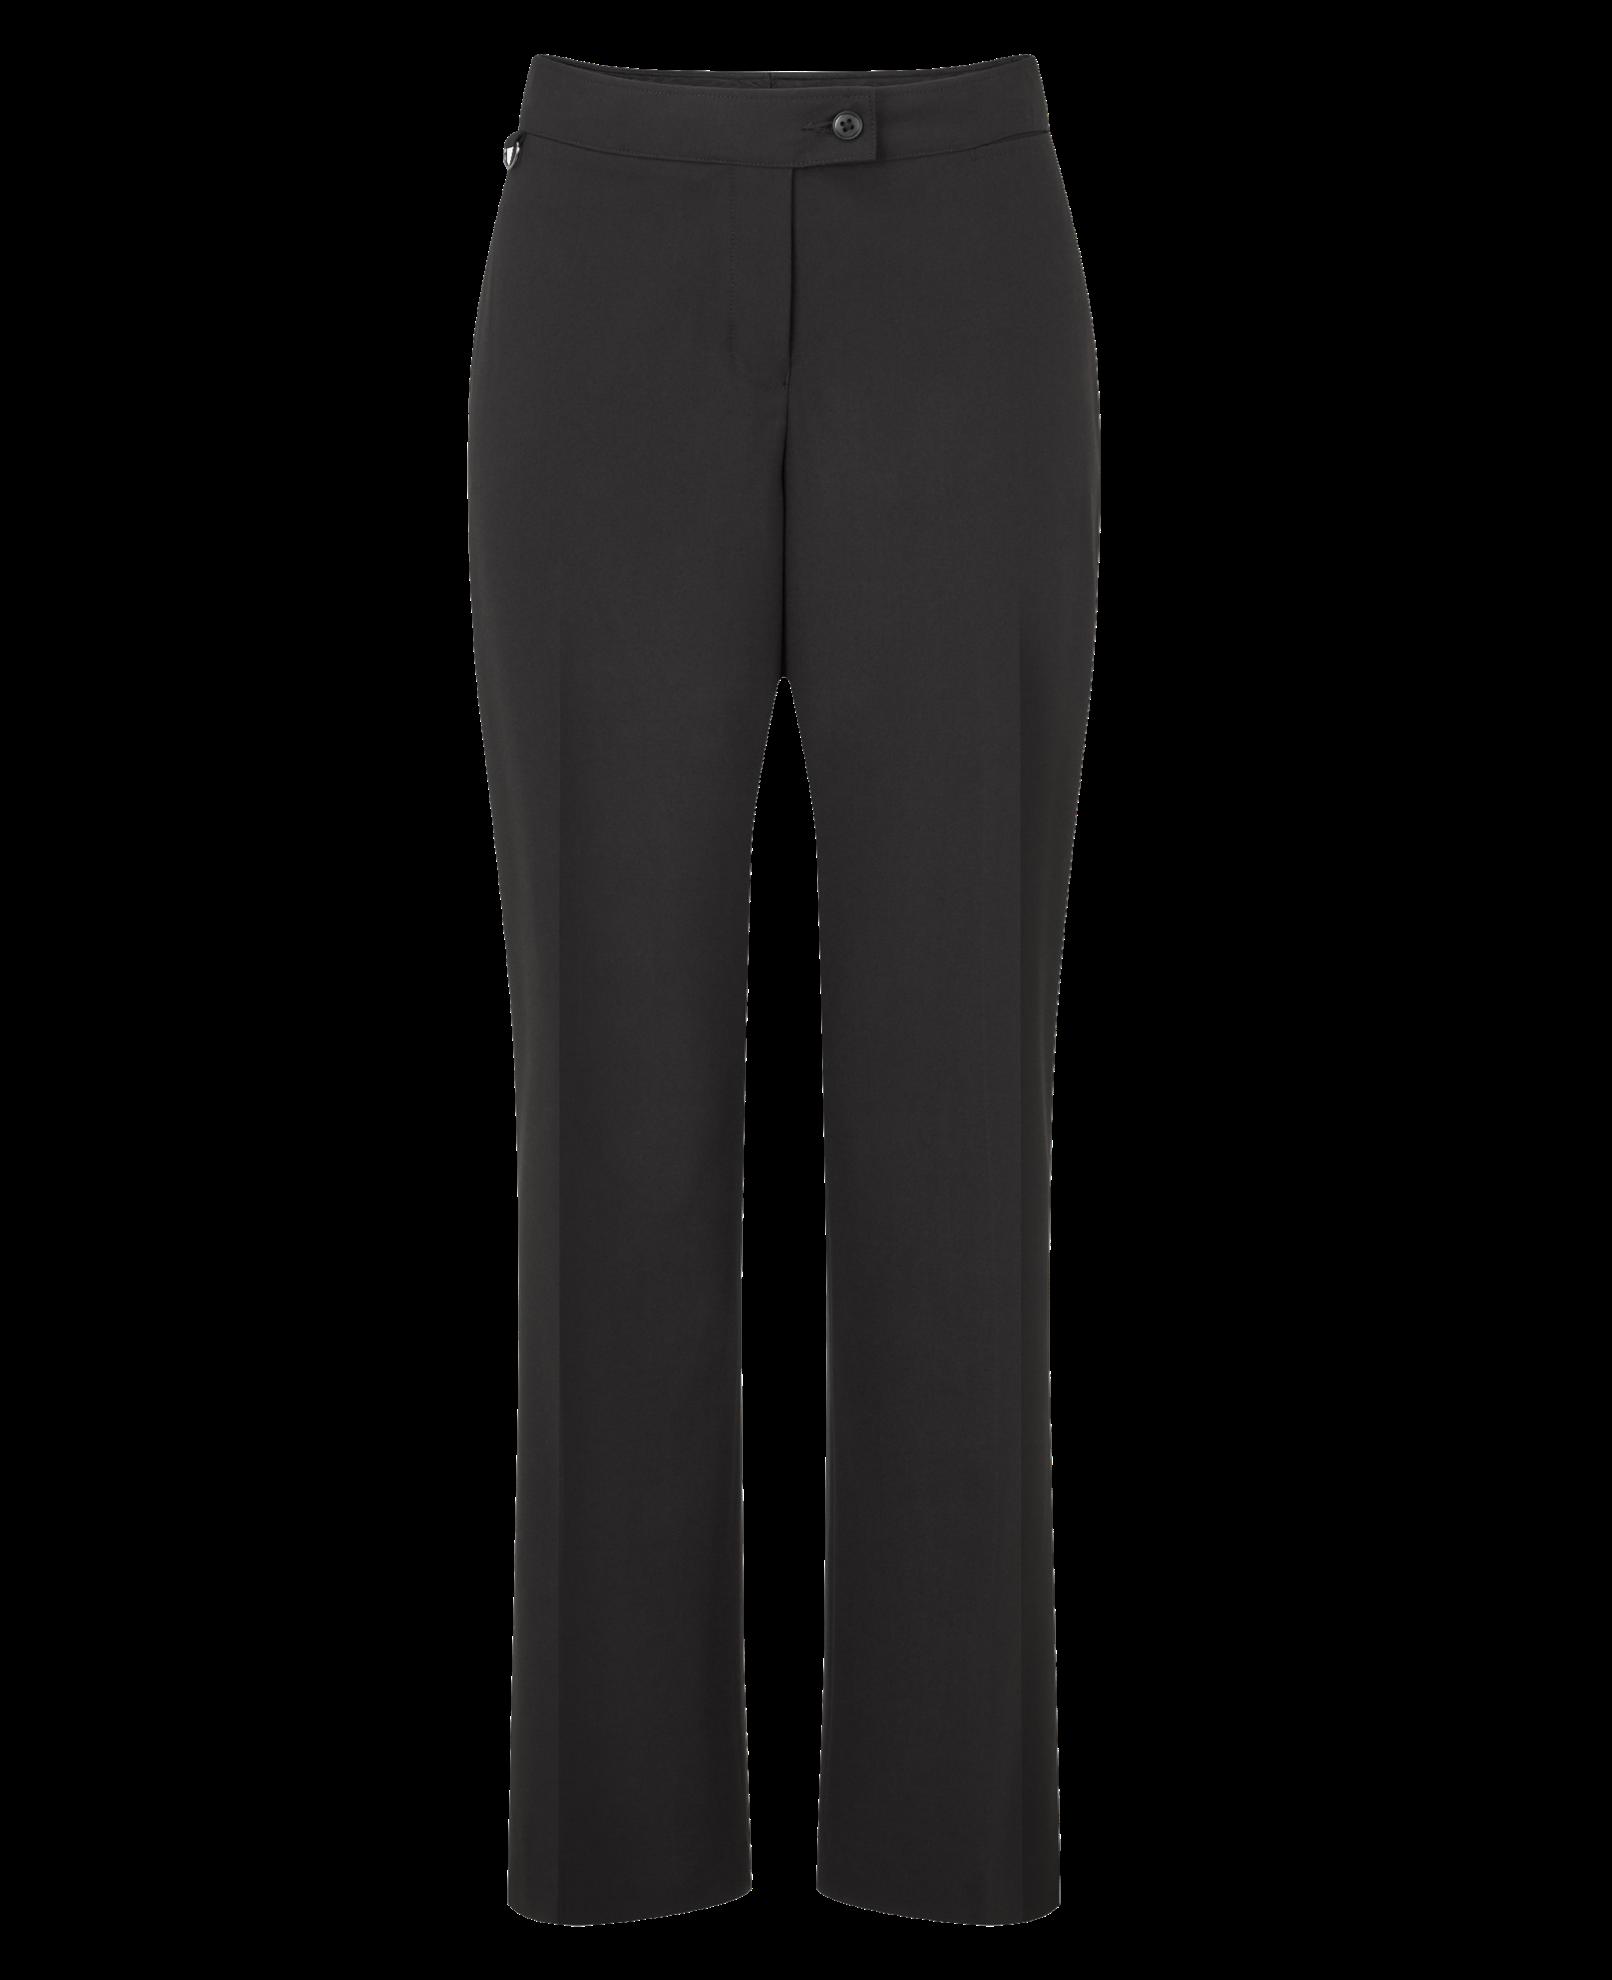 Picture of Finsbury Ladies Trouser - Black